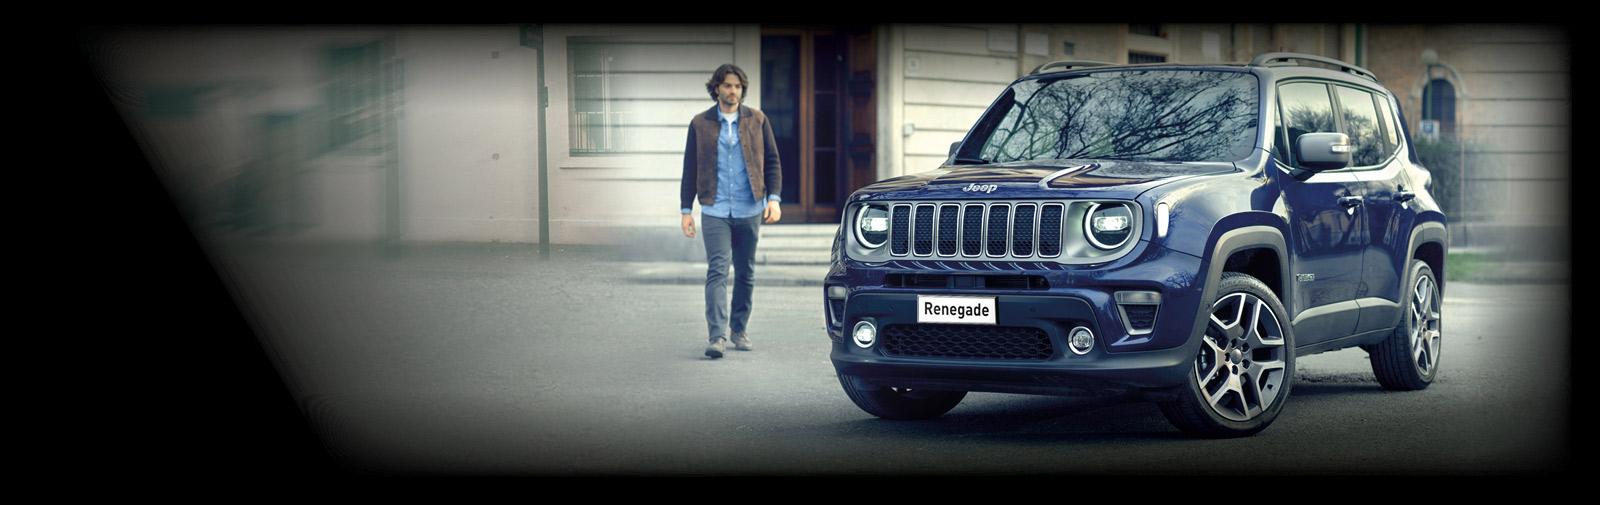 Renegade-Jeep